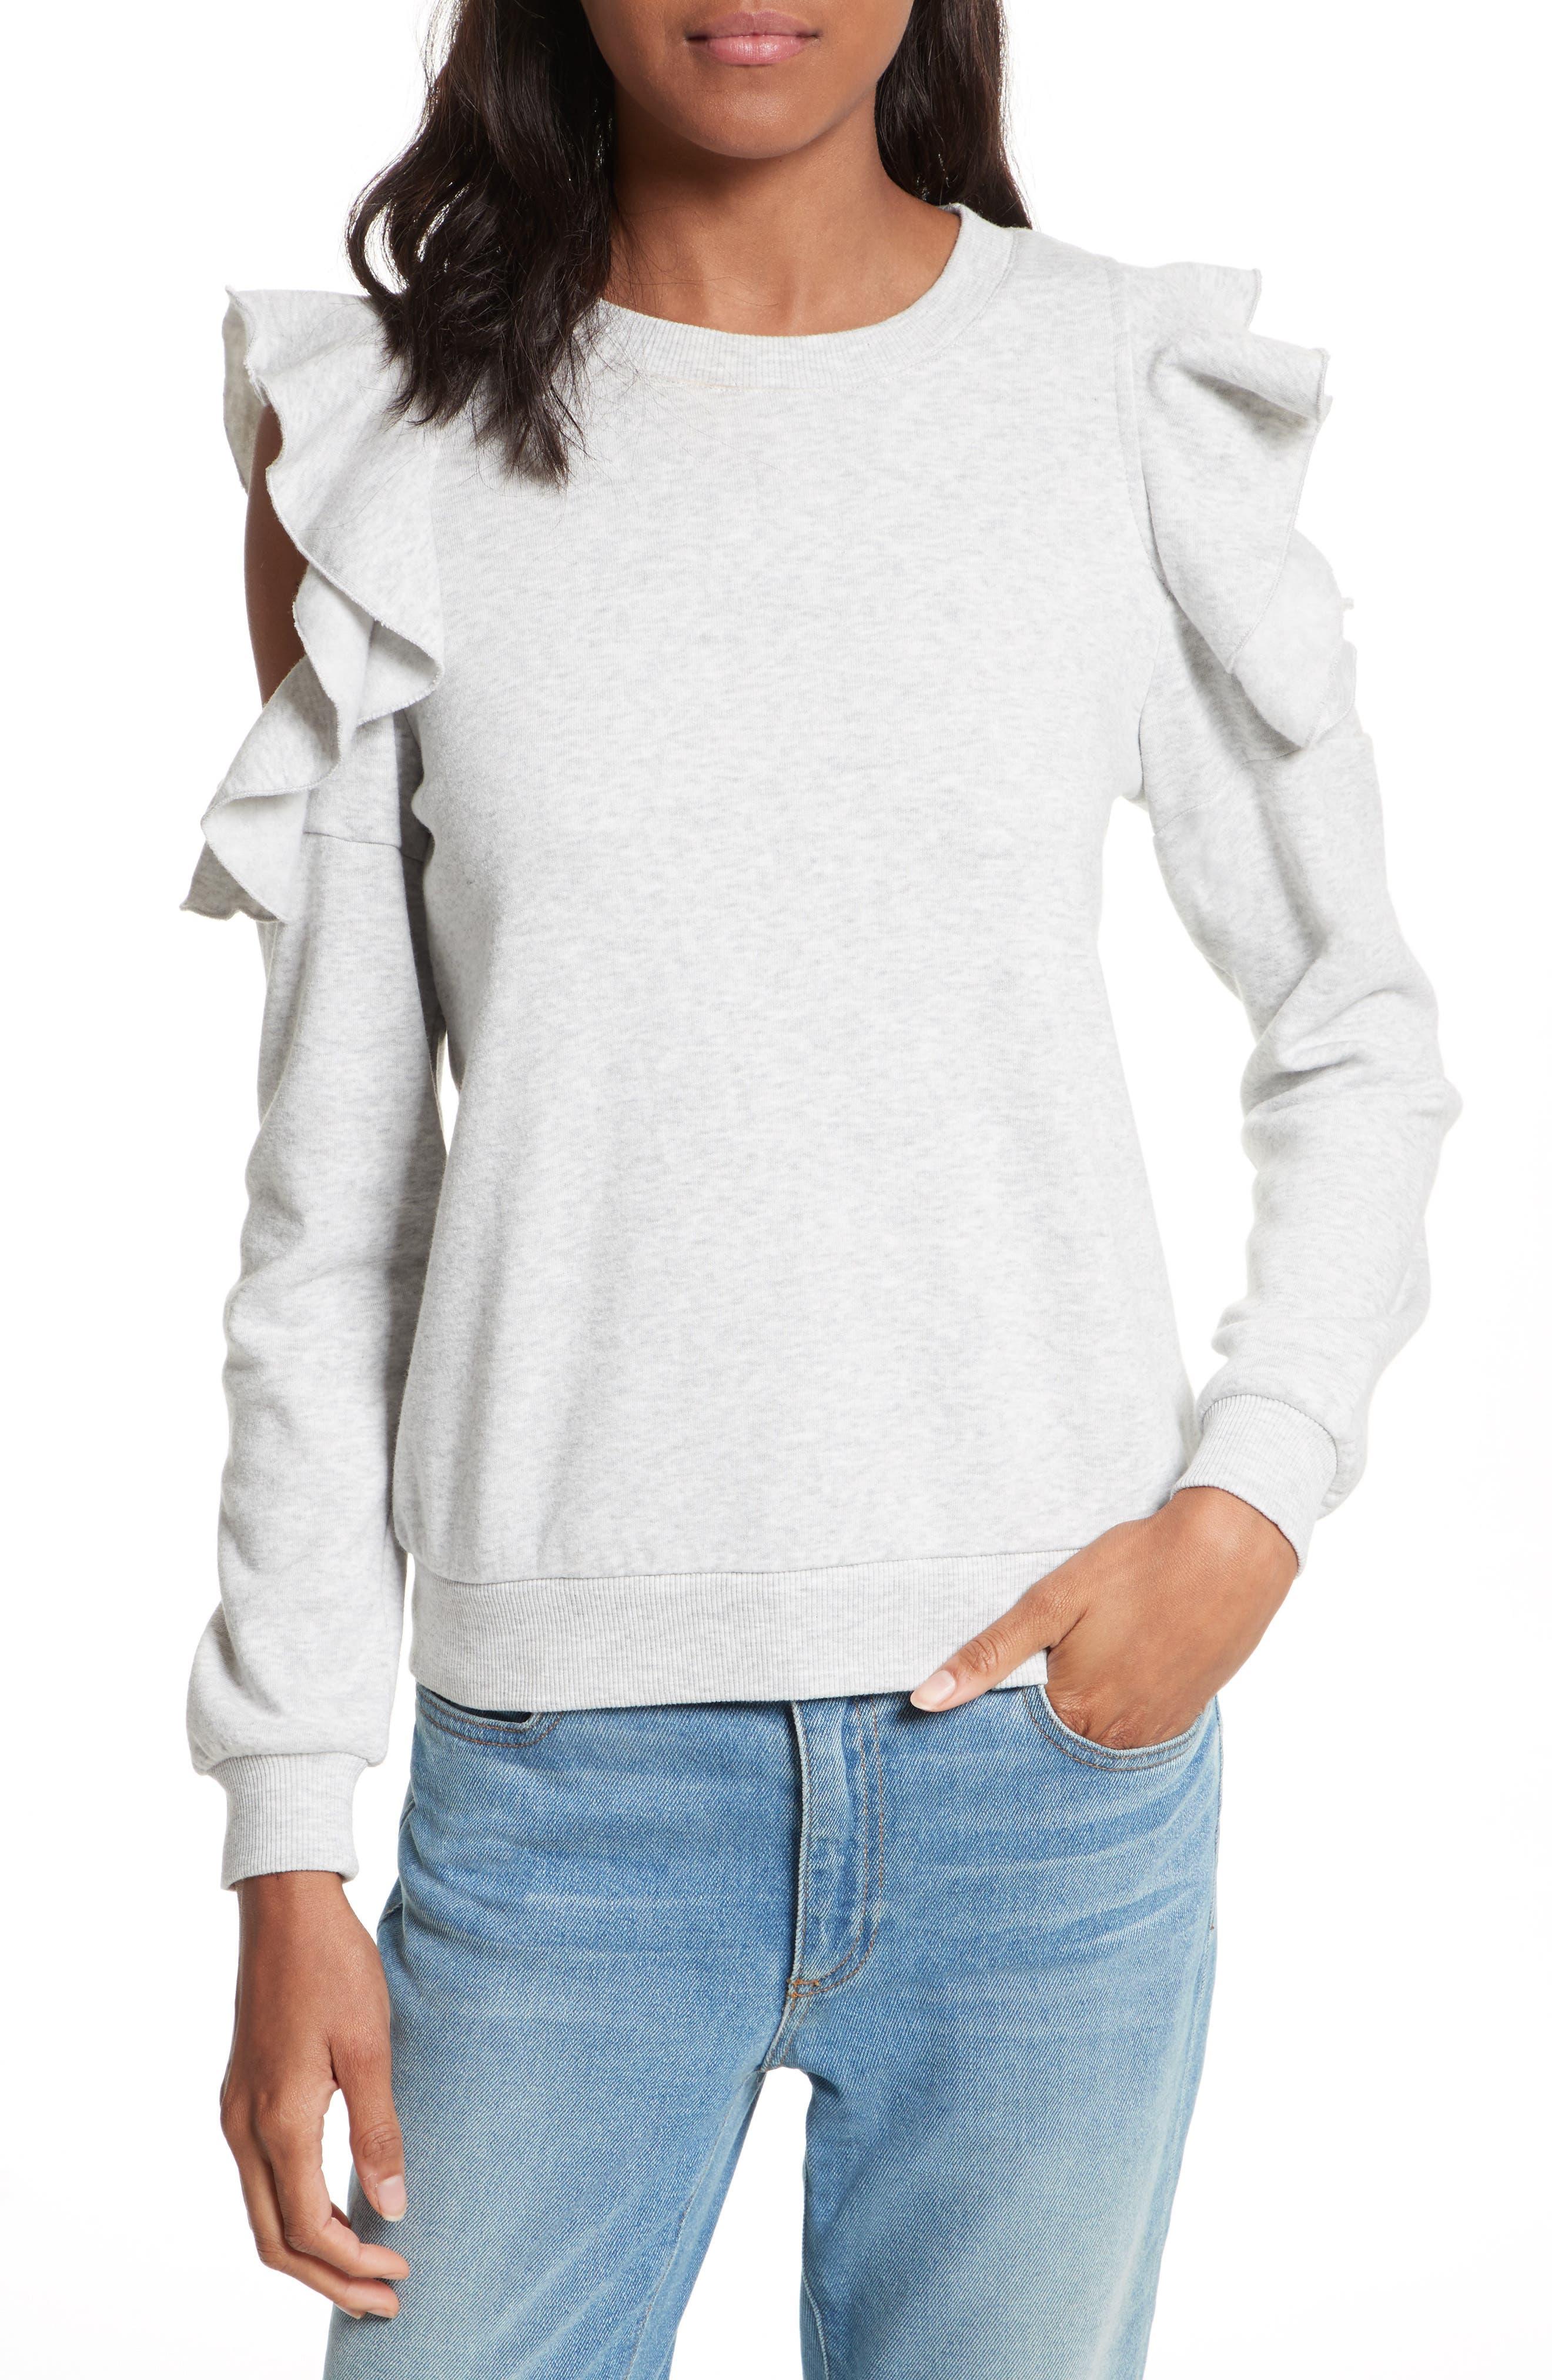 Alternate Image 1 Selected - Rebecca Minkoff Gracie Cold Shoulder Sweatshirt